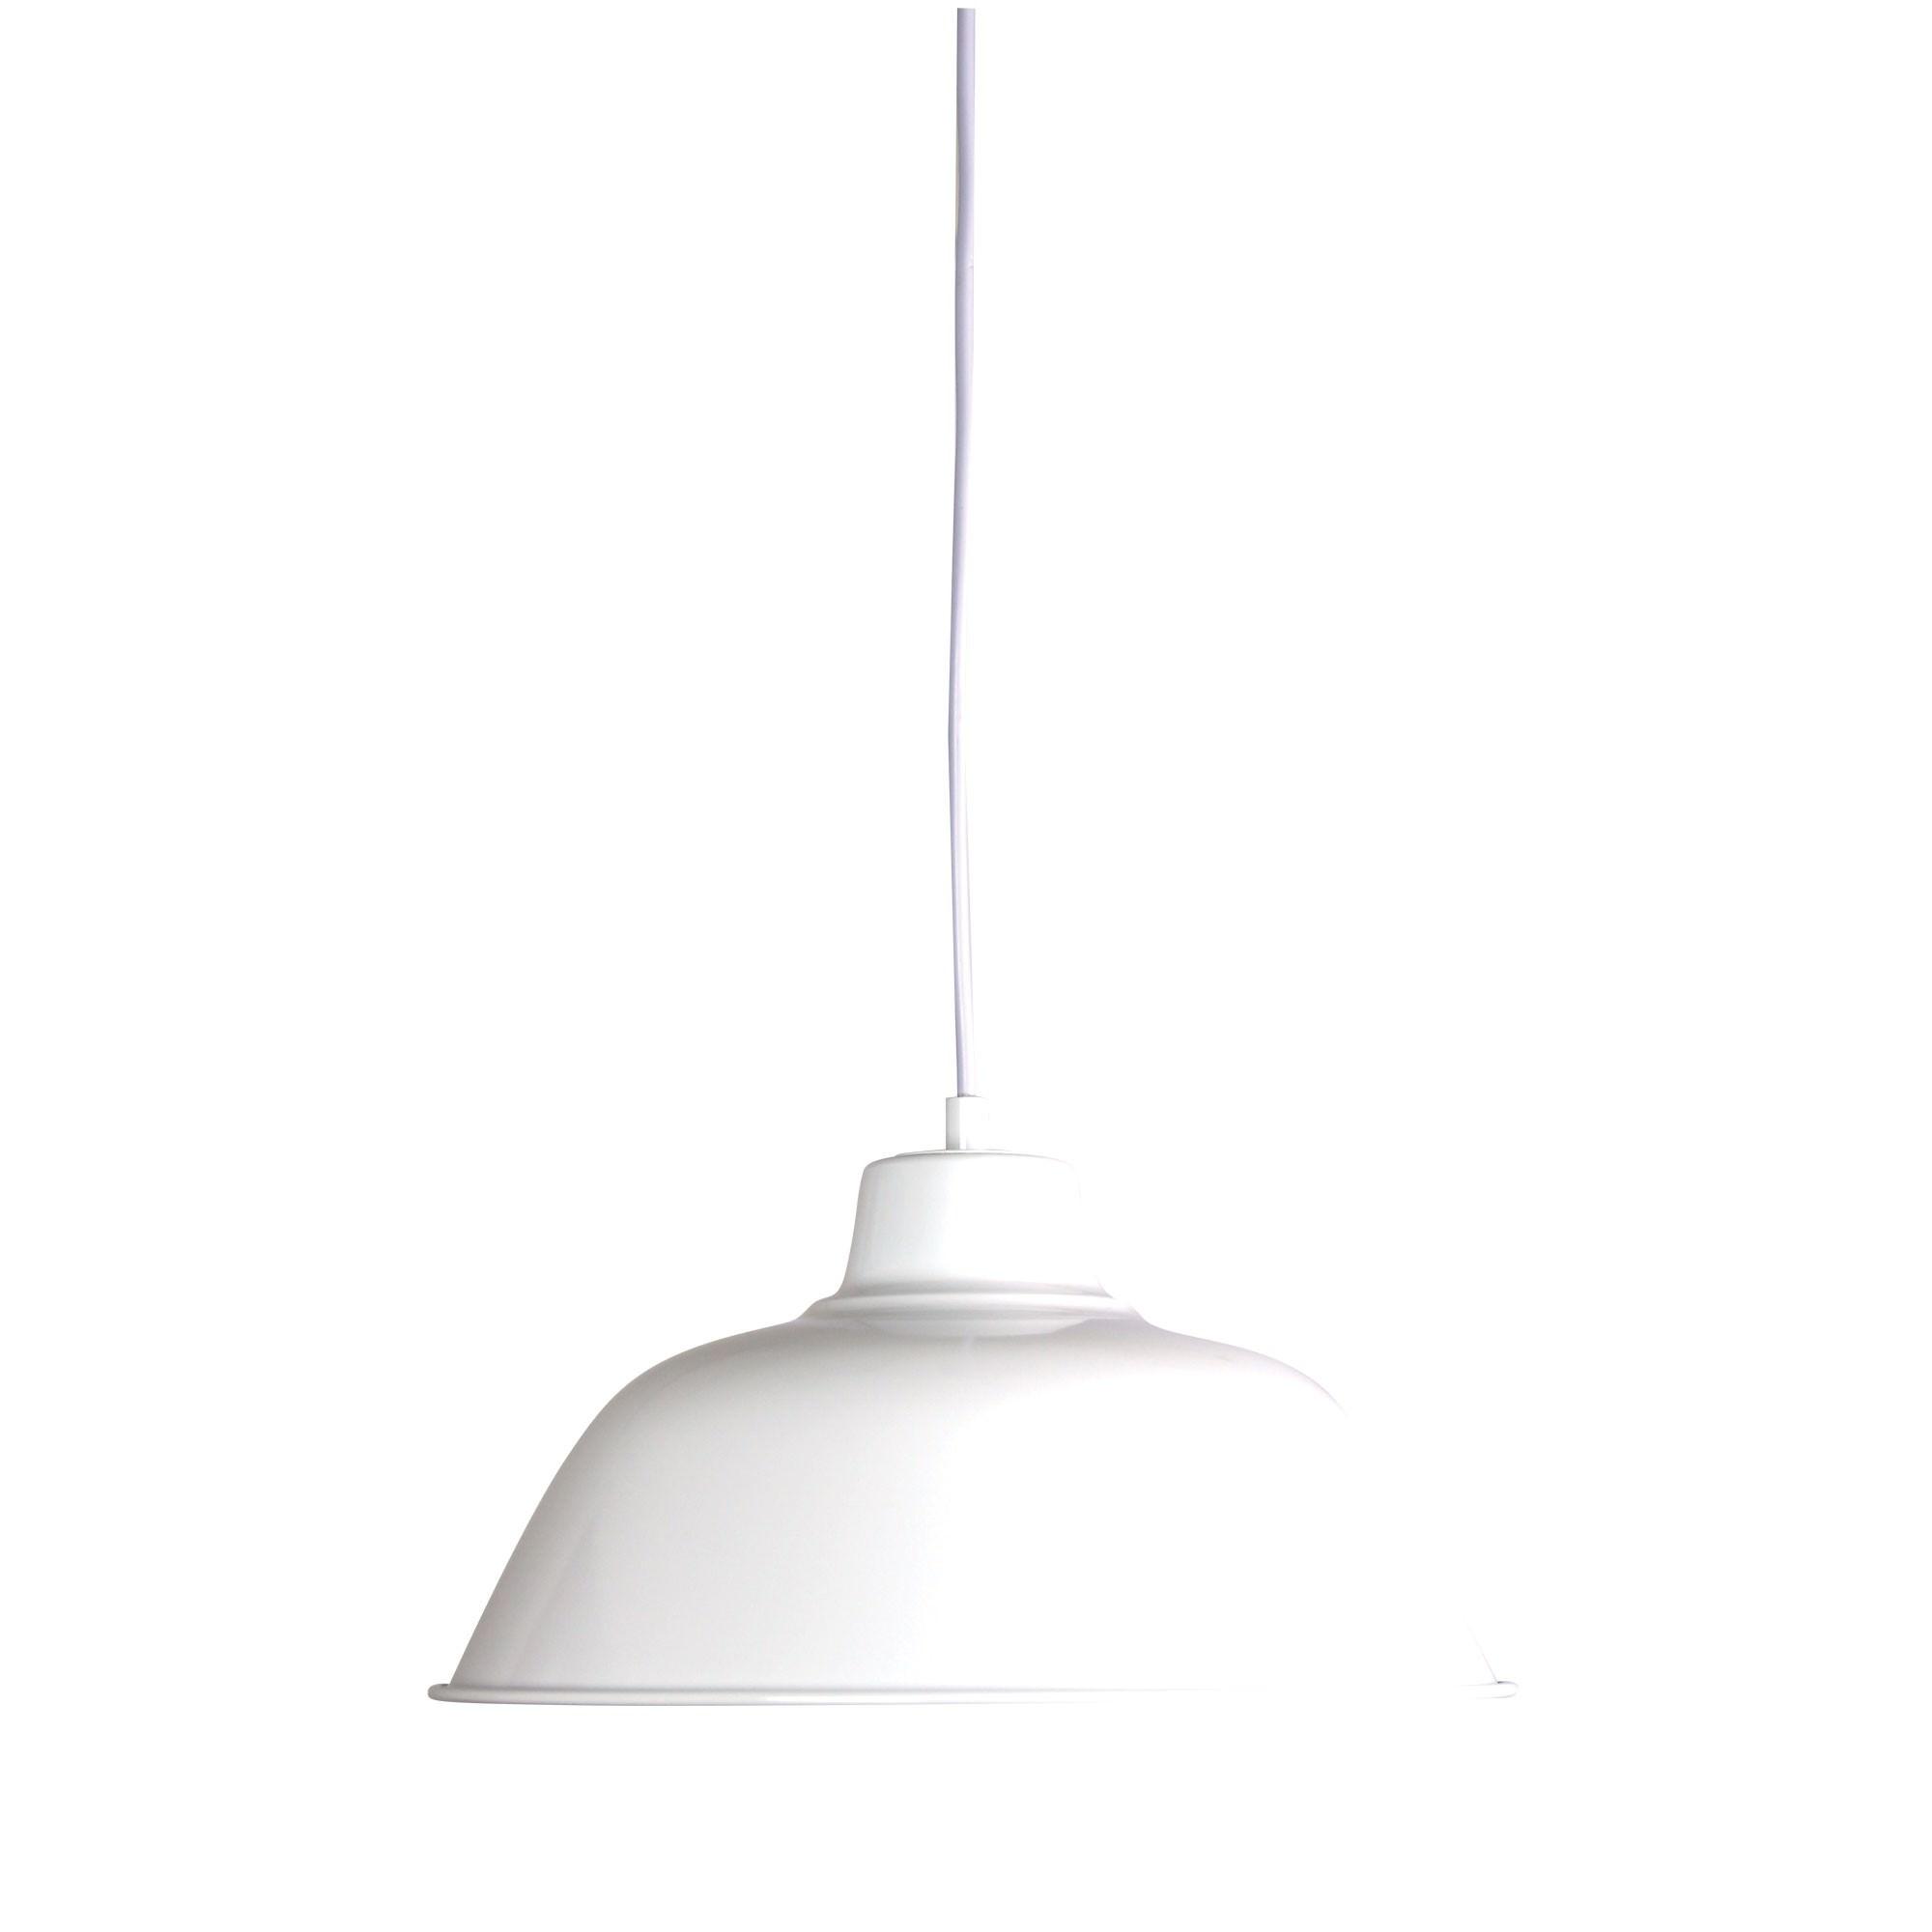 Forge Metal Pendant Light, 30cm, Glass White